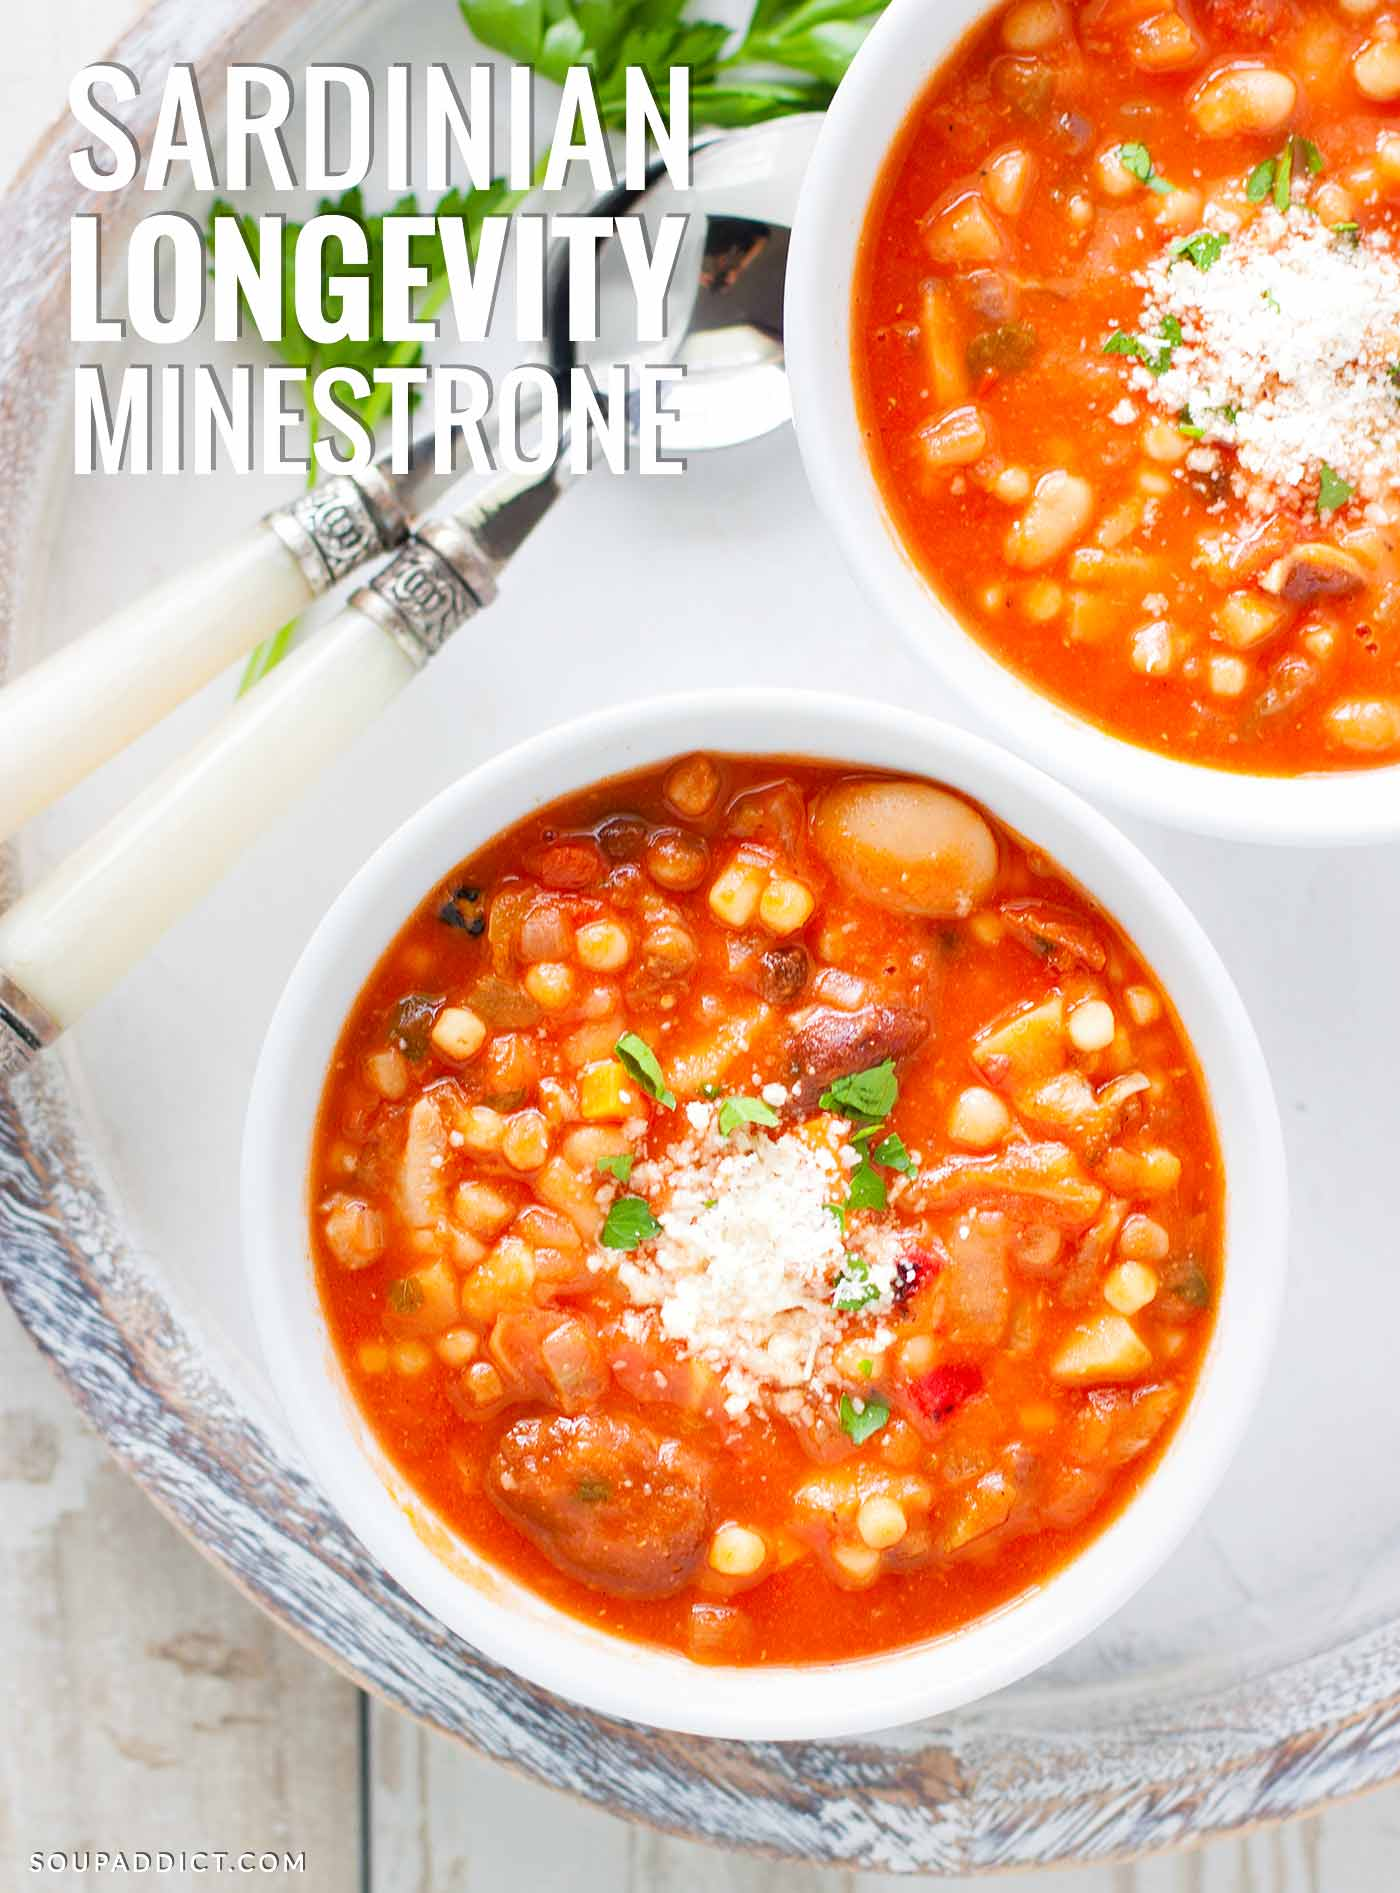 Sardinian Longevity Minestrone Soup | Recipe at SoupAddict.com